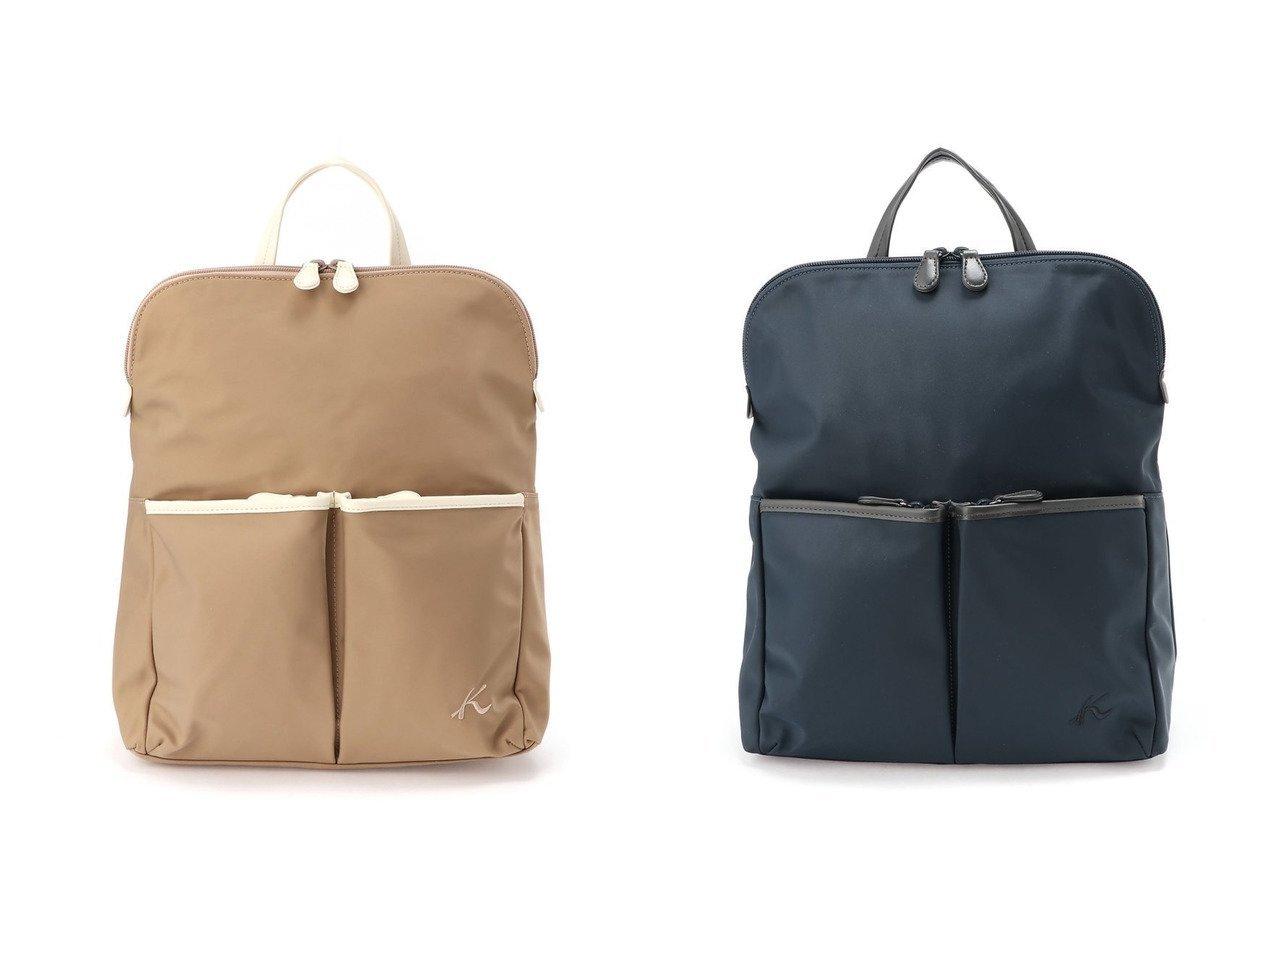 【Kitamura/キタムラ】のリュック Y-1005 【バッグ・鞄】おすすめ!人気、トレンド・レディースファッションの通販    レディースファッション・服の通販 founy(ファニー)